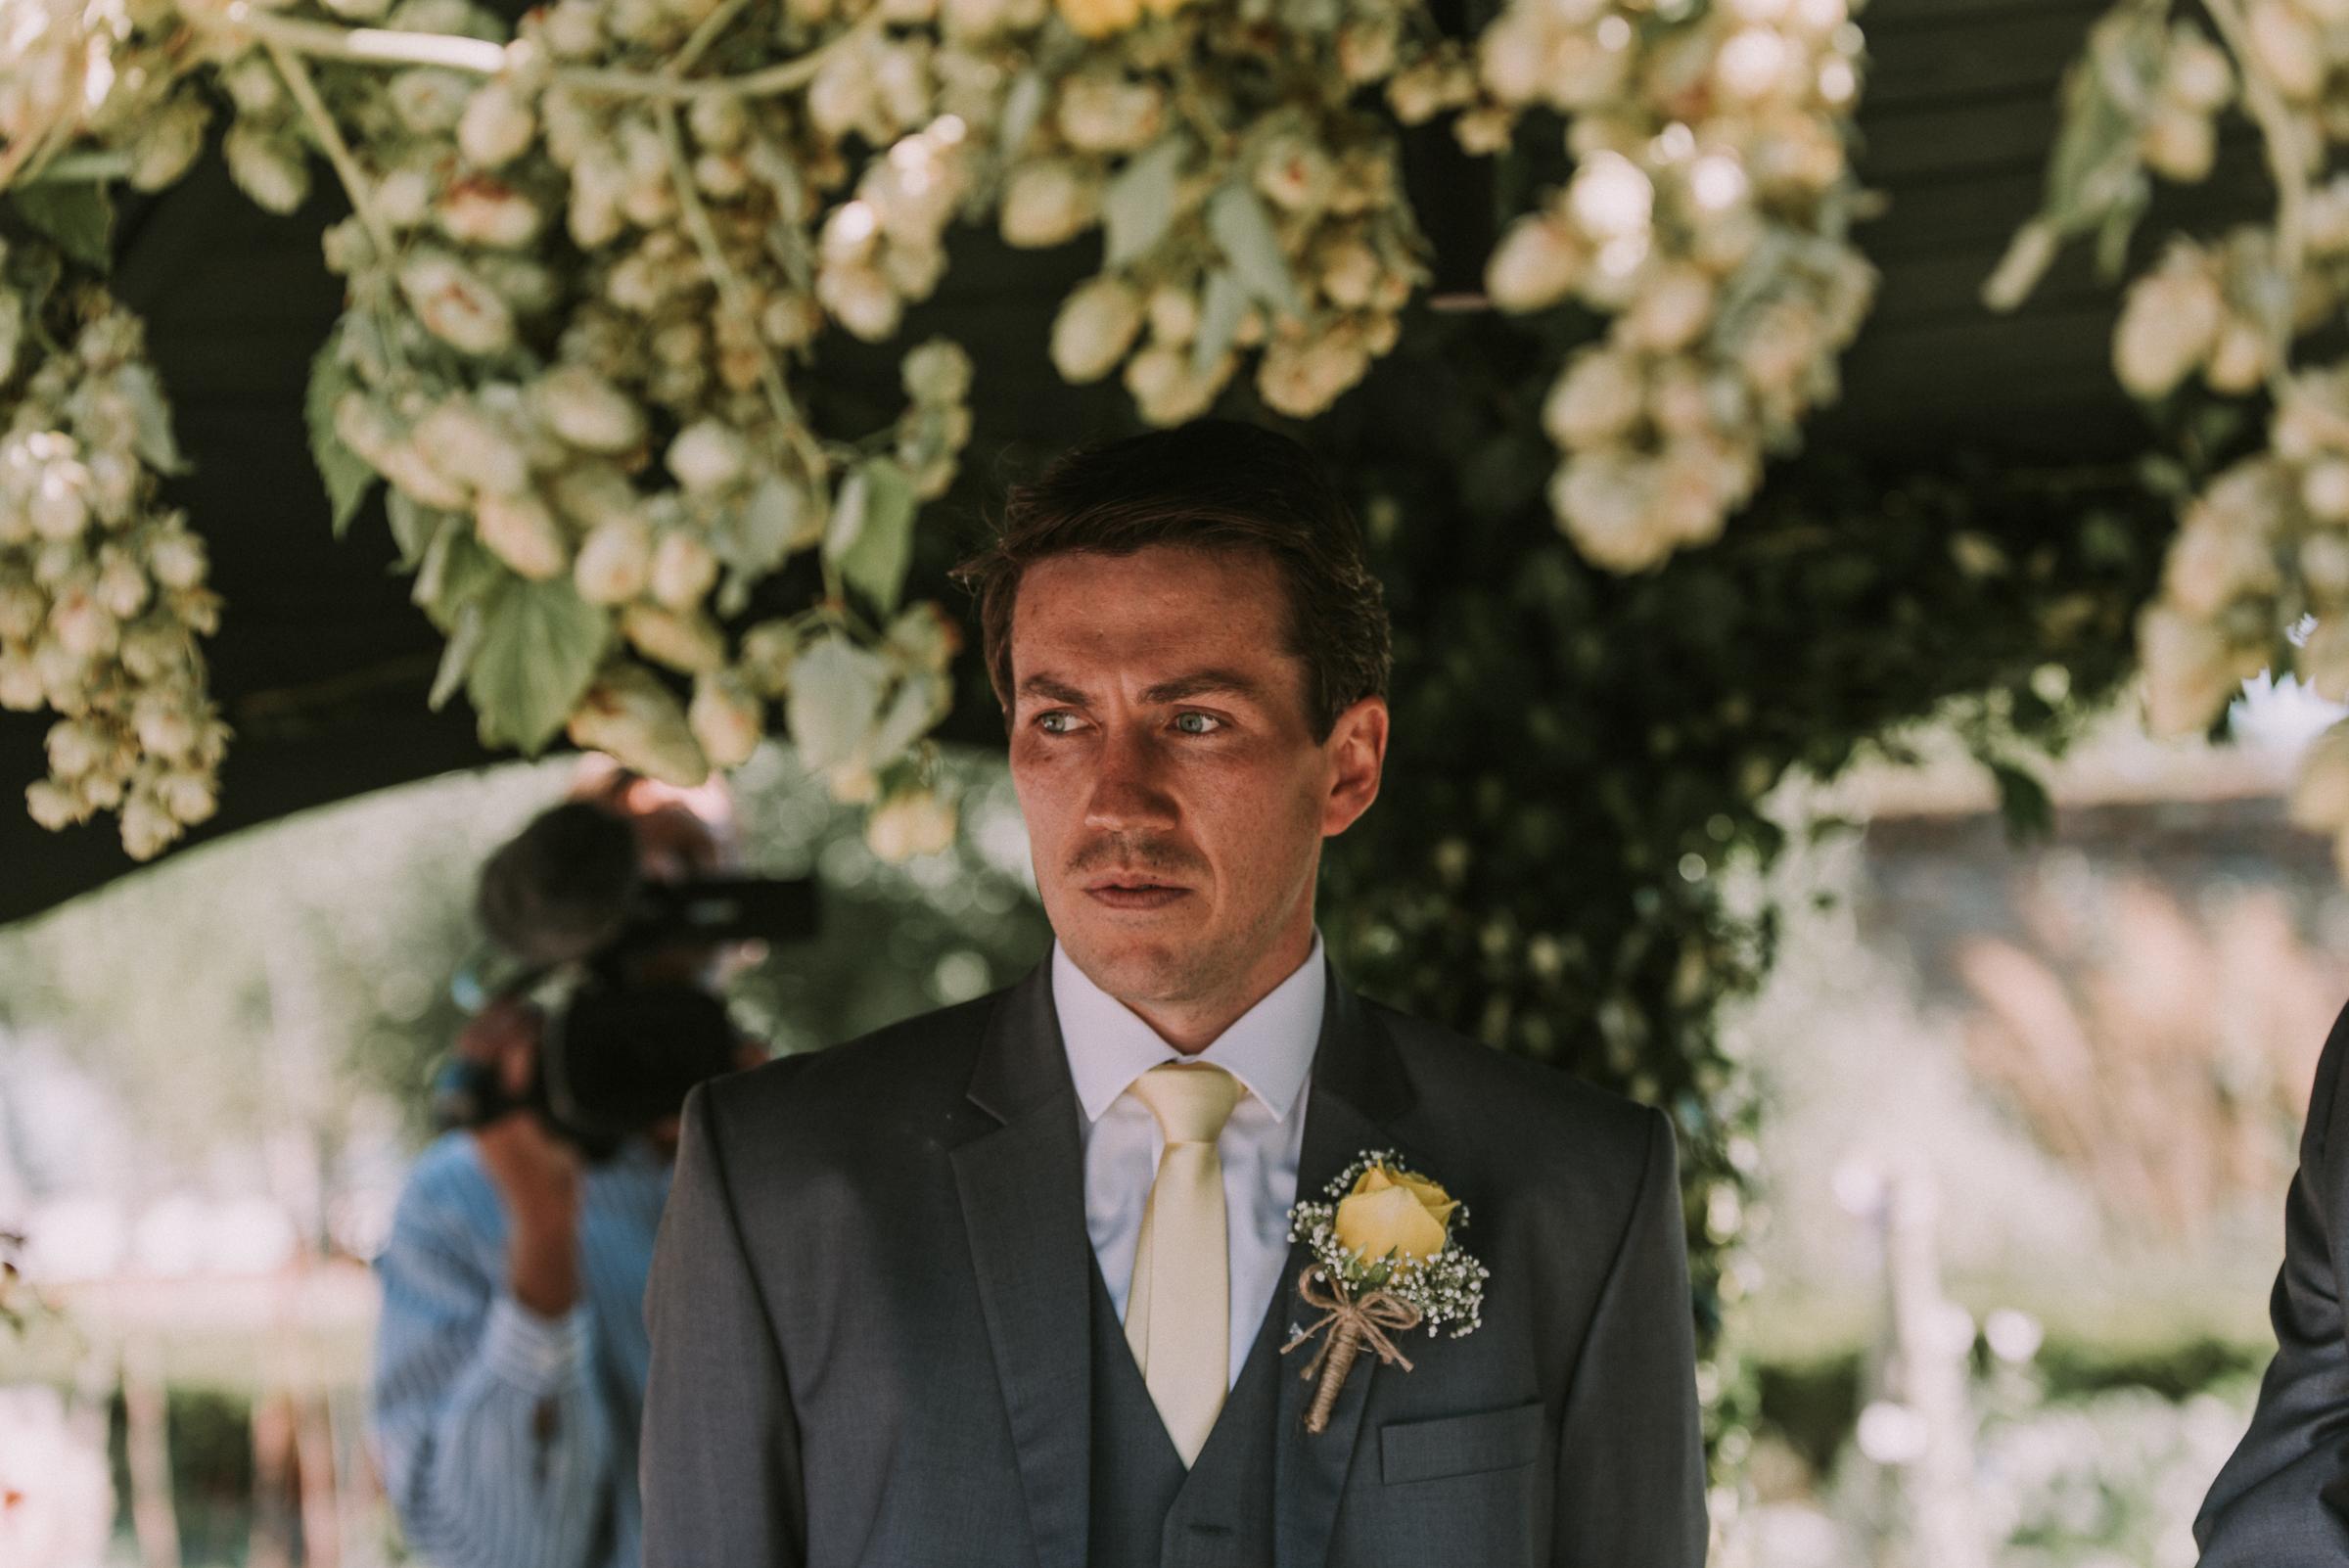 Festival Wedding Photography Secret Garden Maidstone Kent Jay Tunbridge Photorgaphic Co-20.jpg